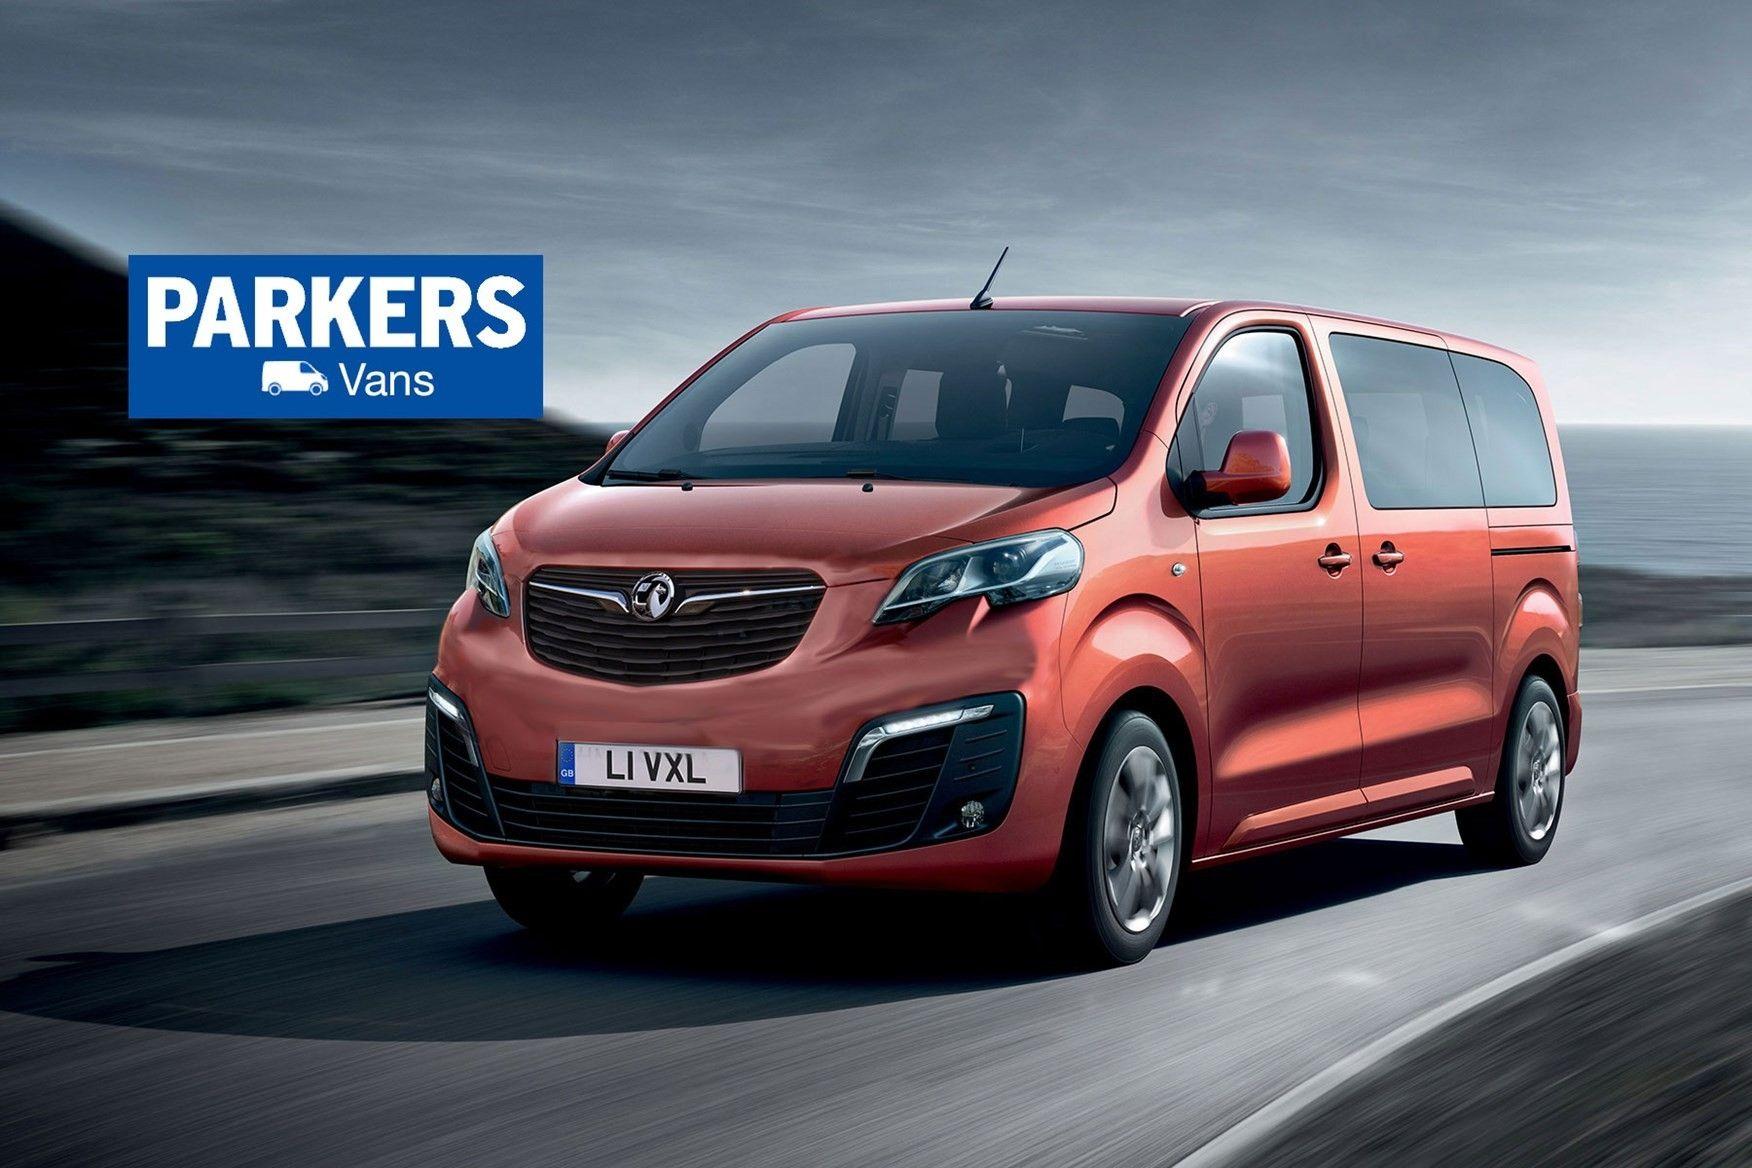 Opel Vivaro 2019 Redesign Opel Car Chevrolet Trailblazer